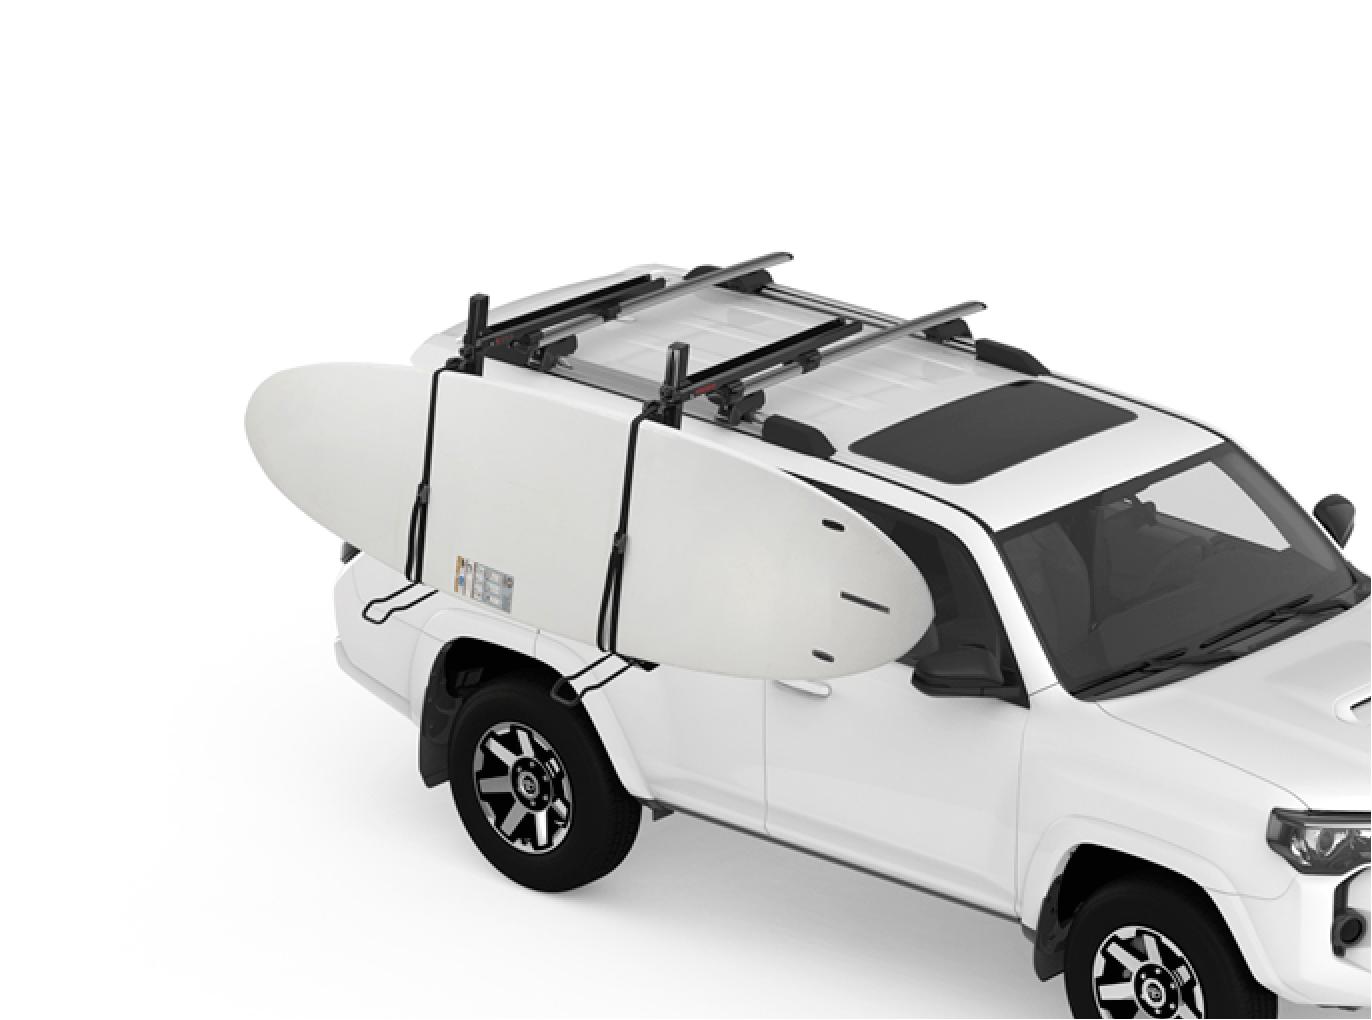 Stand Up Paddle Board Car Rack Demo Showdown Side Loading Sup and Kayak Carrier Modula Racks